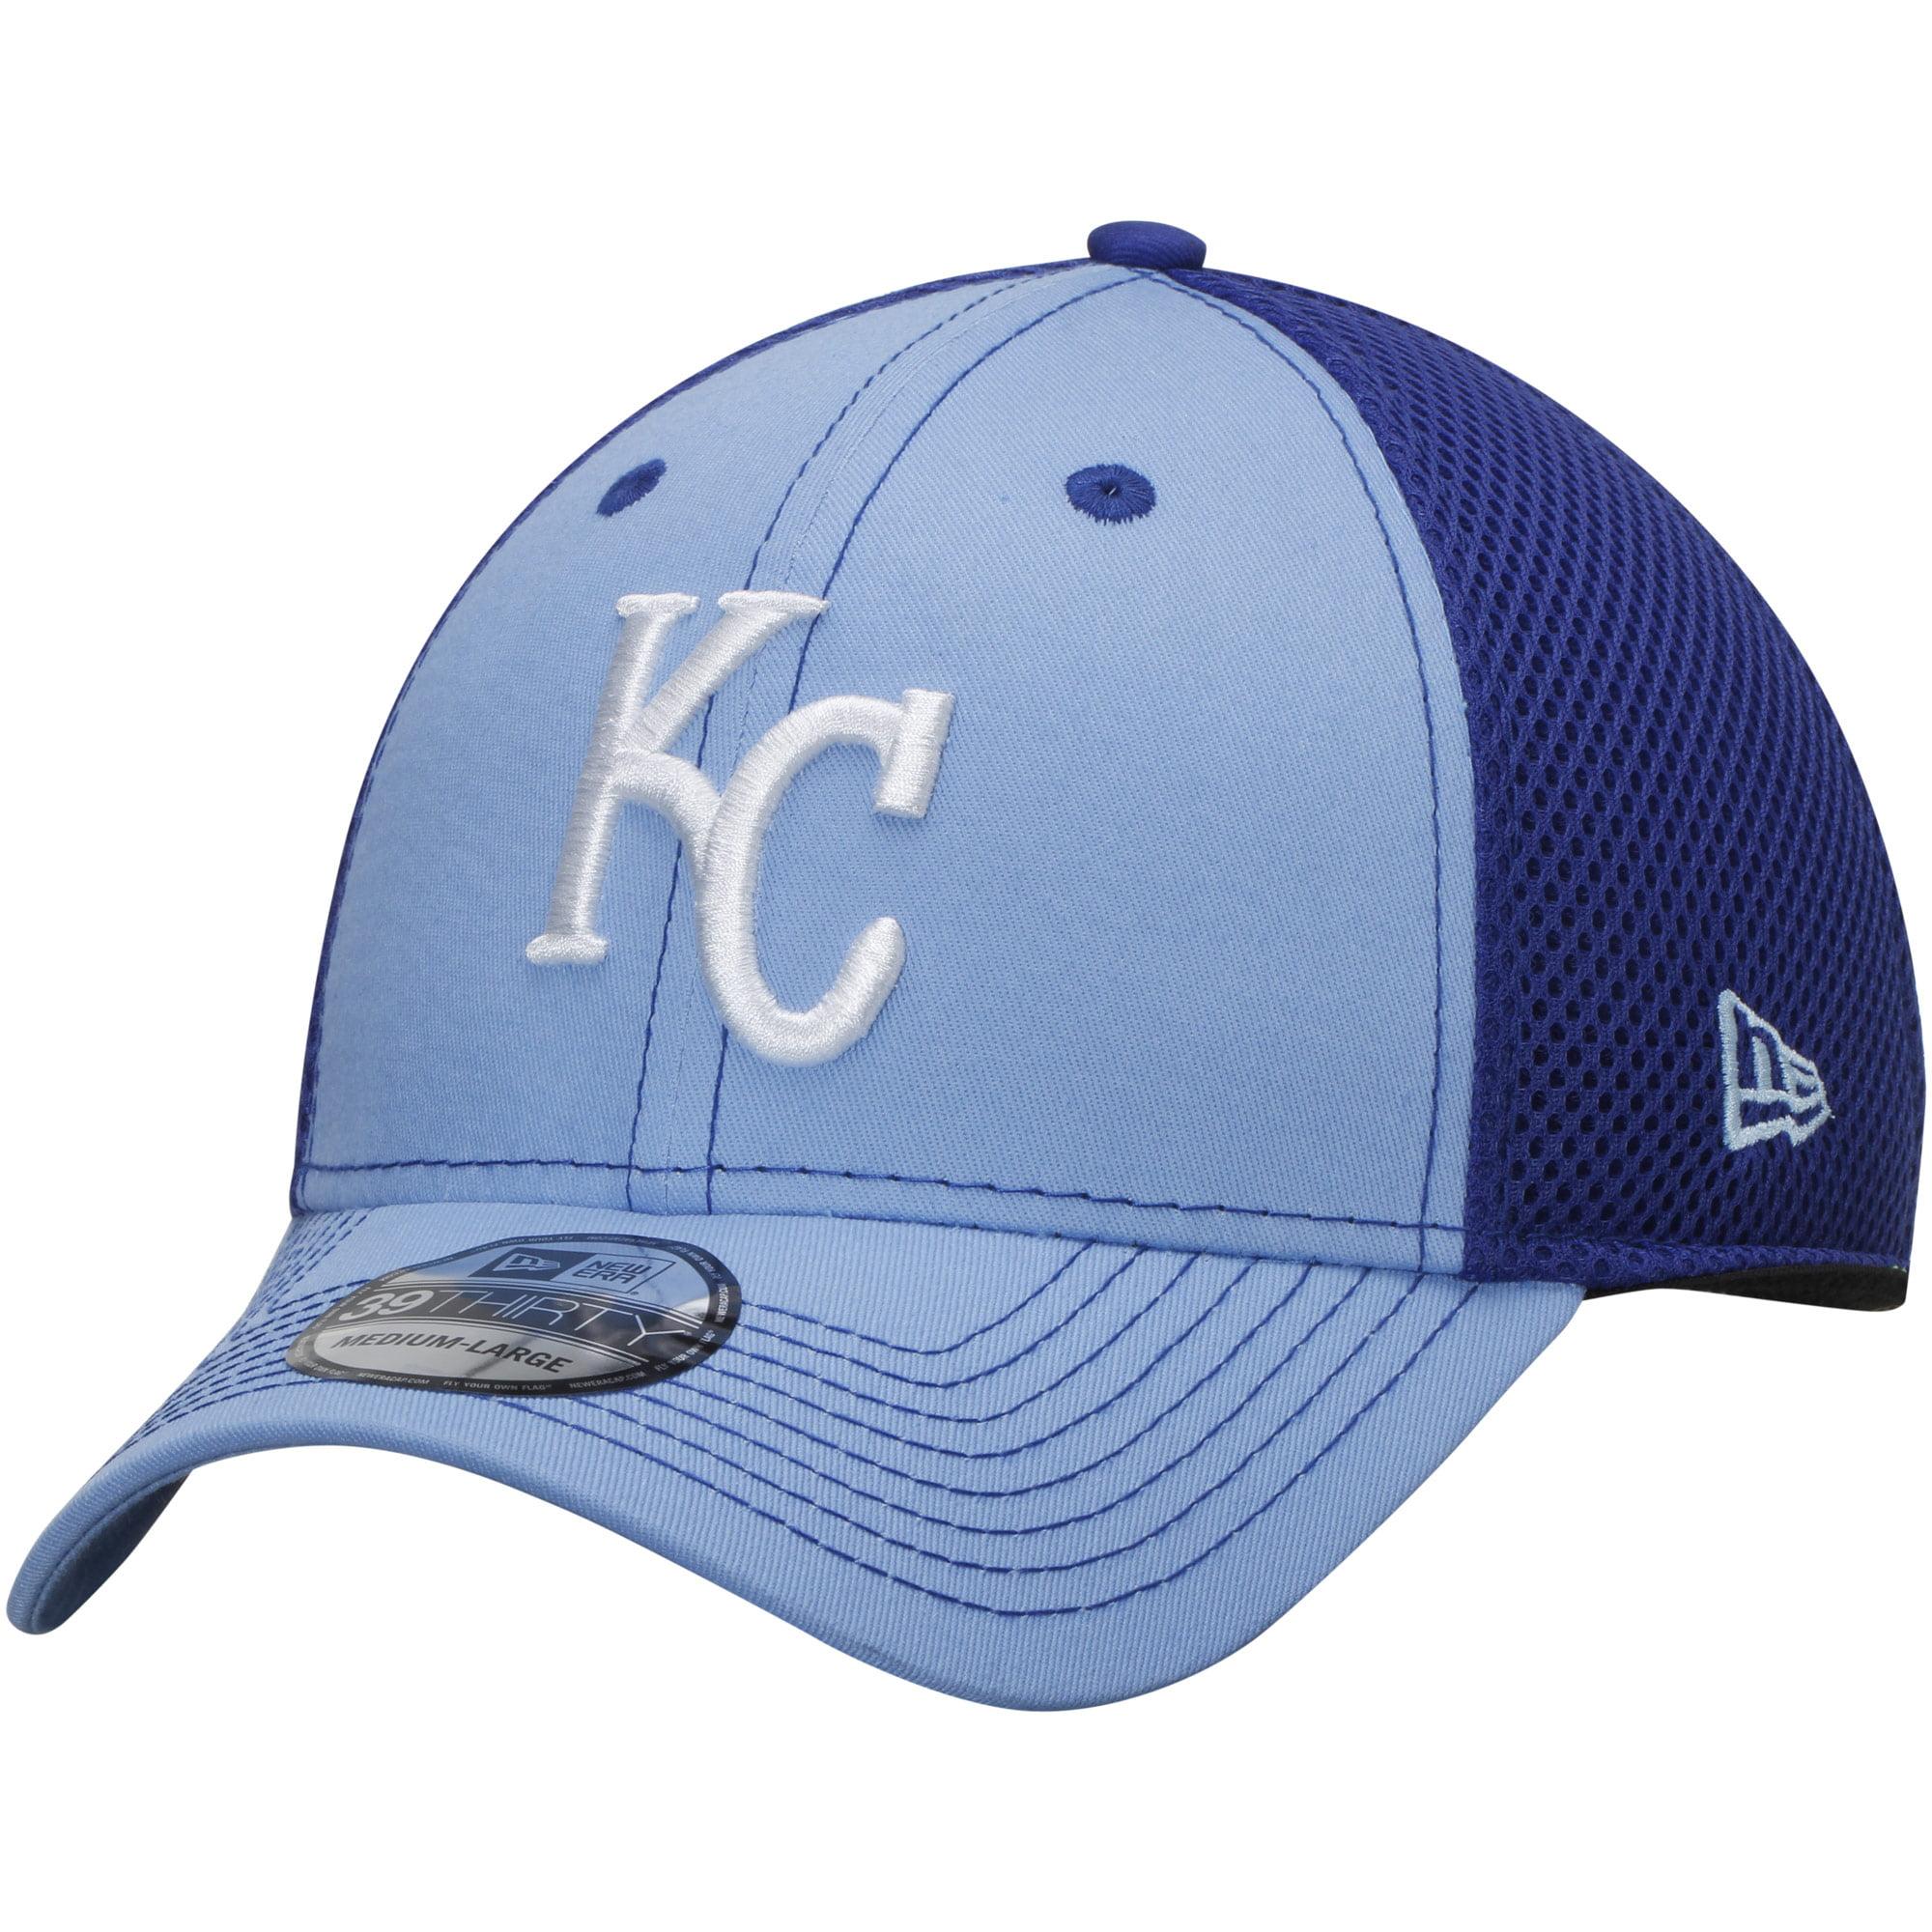 Kansas City Royals New Era Team Front Neo 39THIRTY Flex Hat - Royal/White